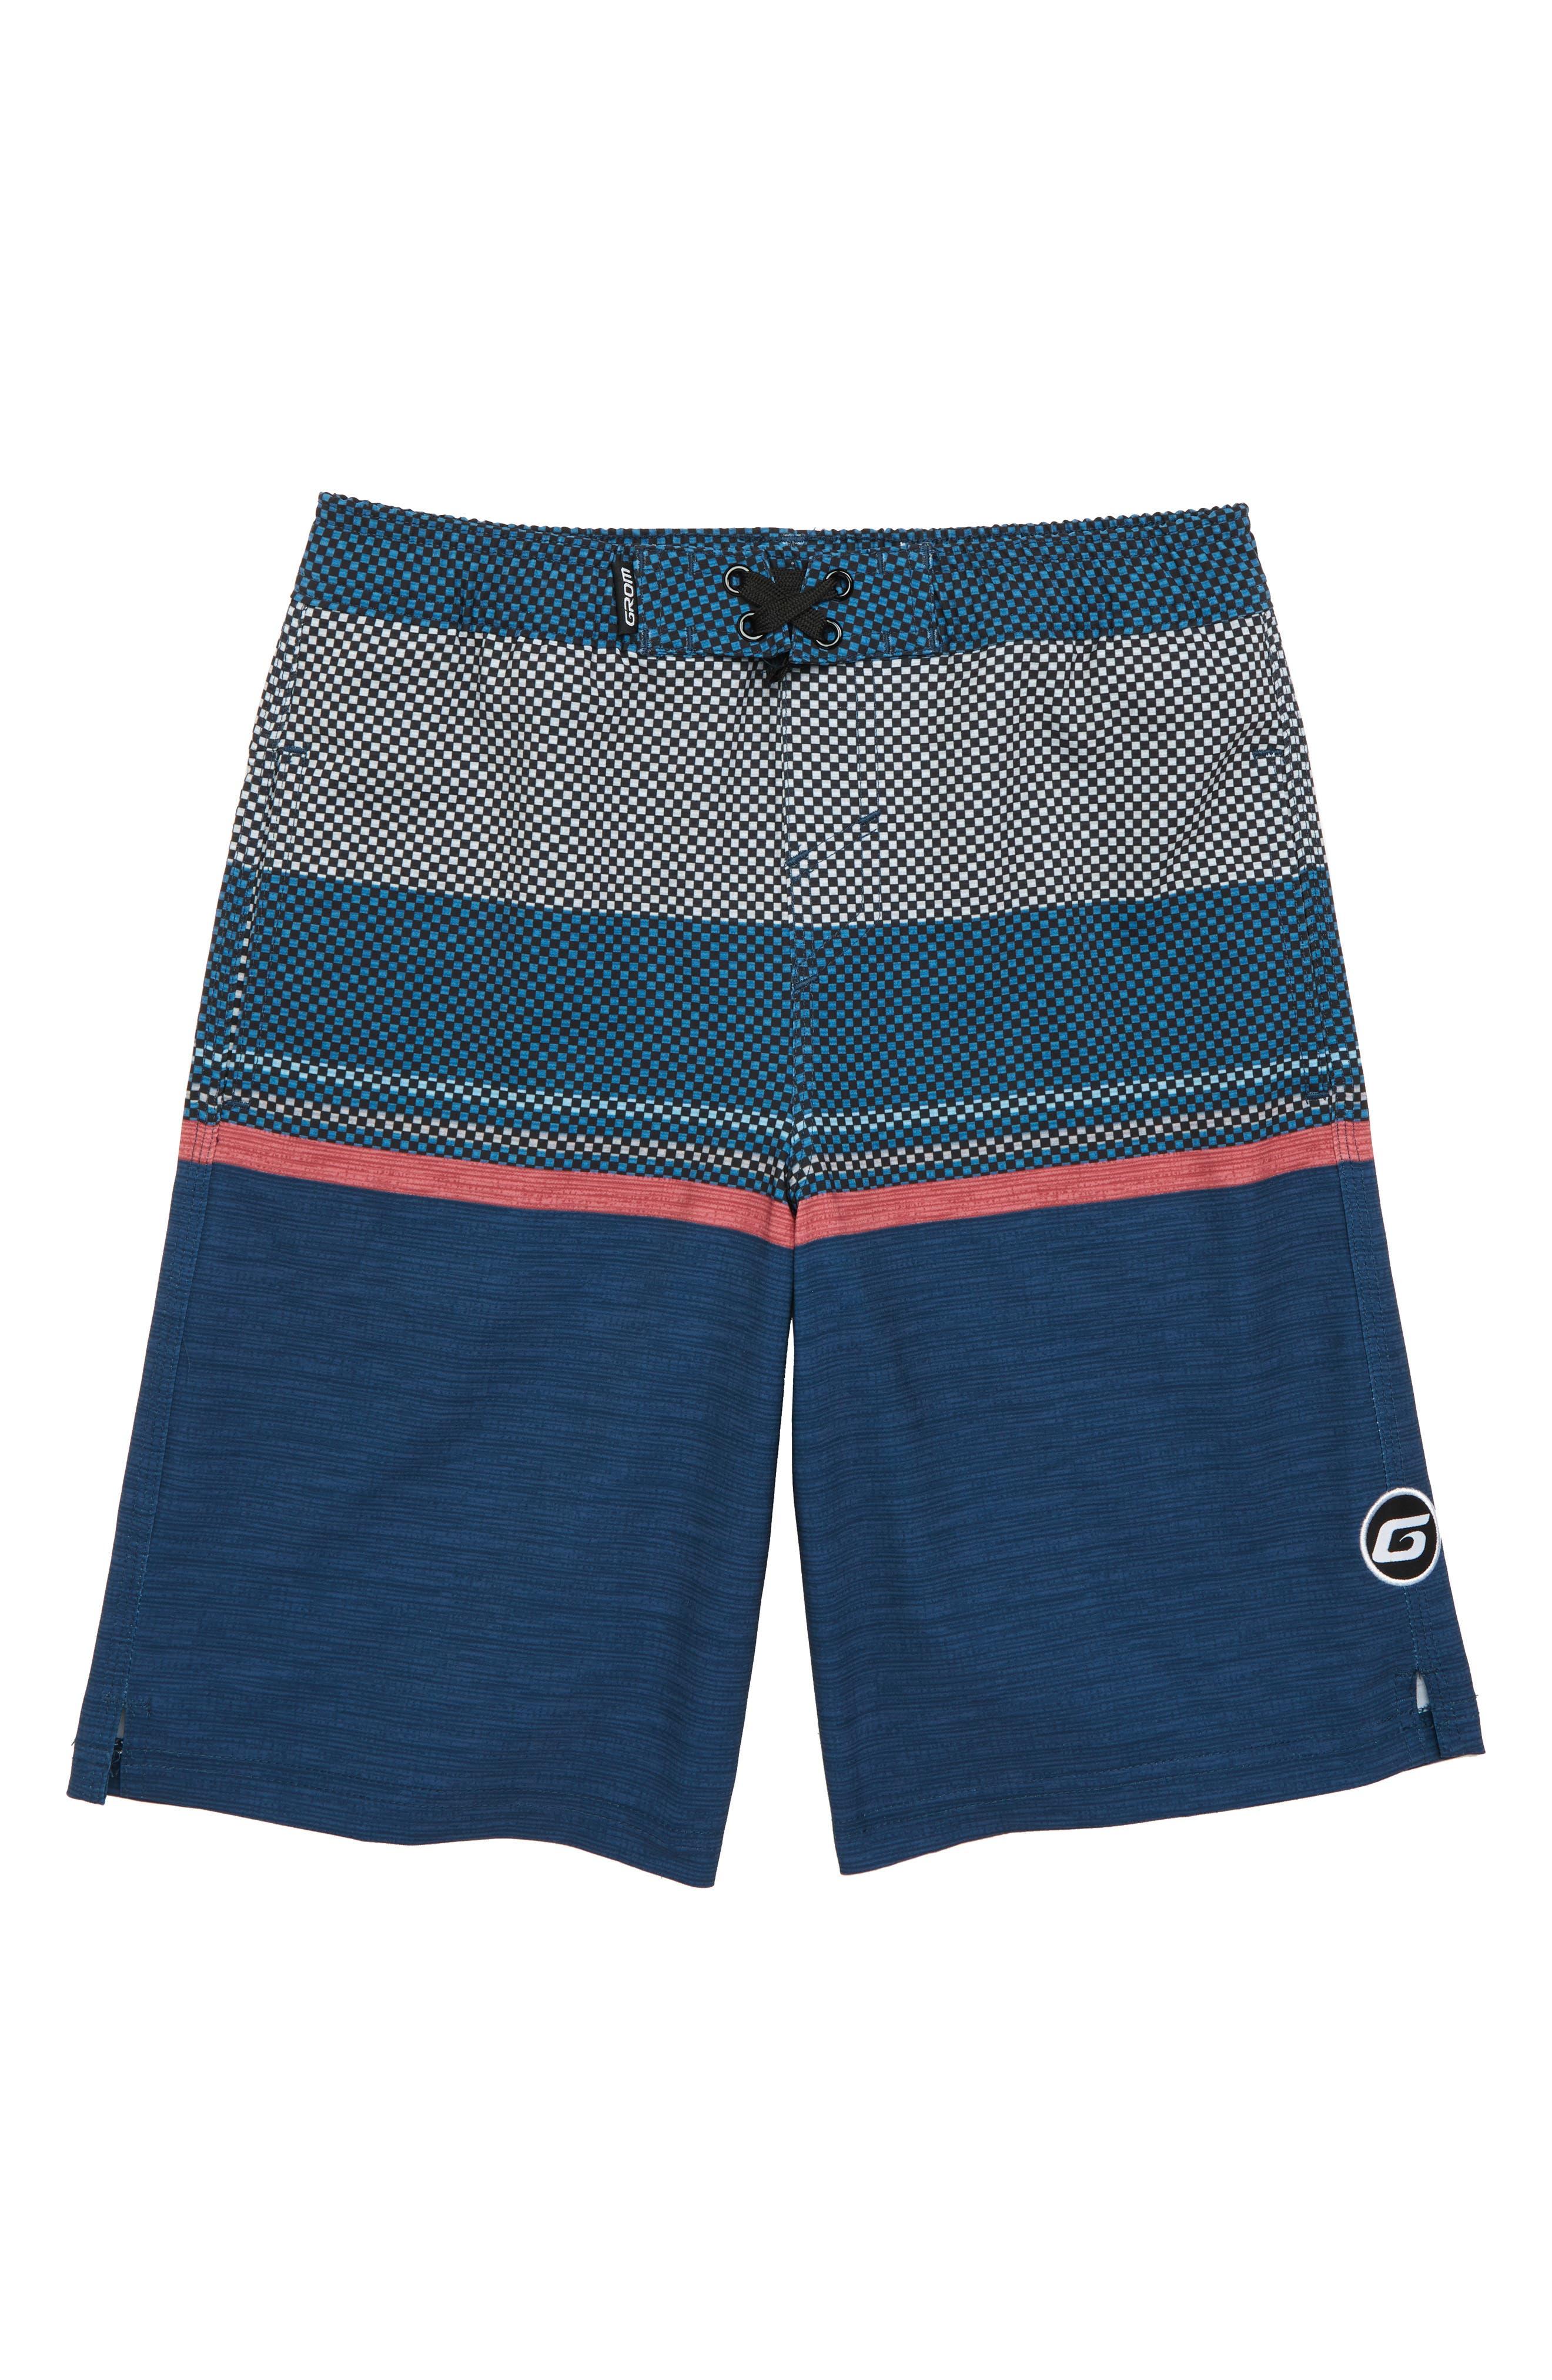 Horizon Board Shorts,                         Main,                         color, BLUE